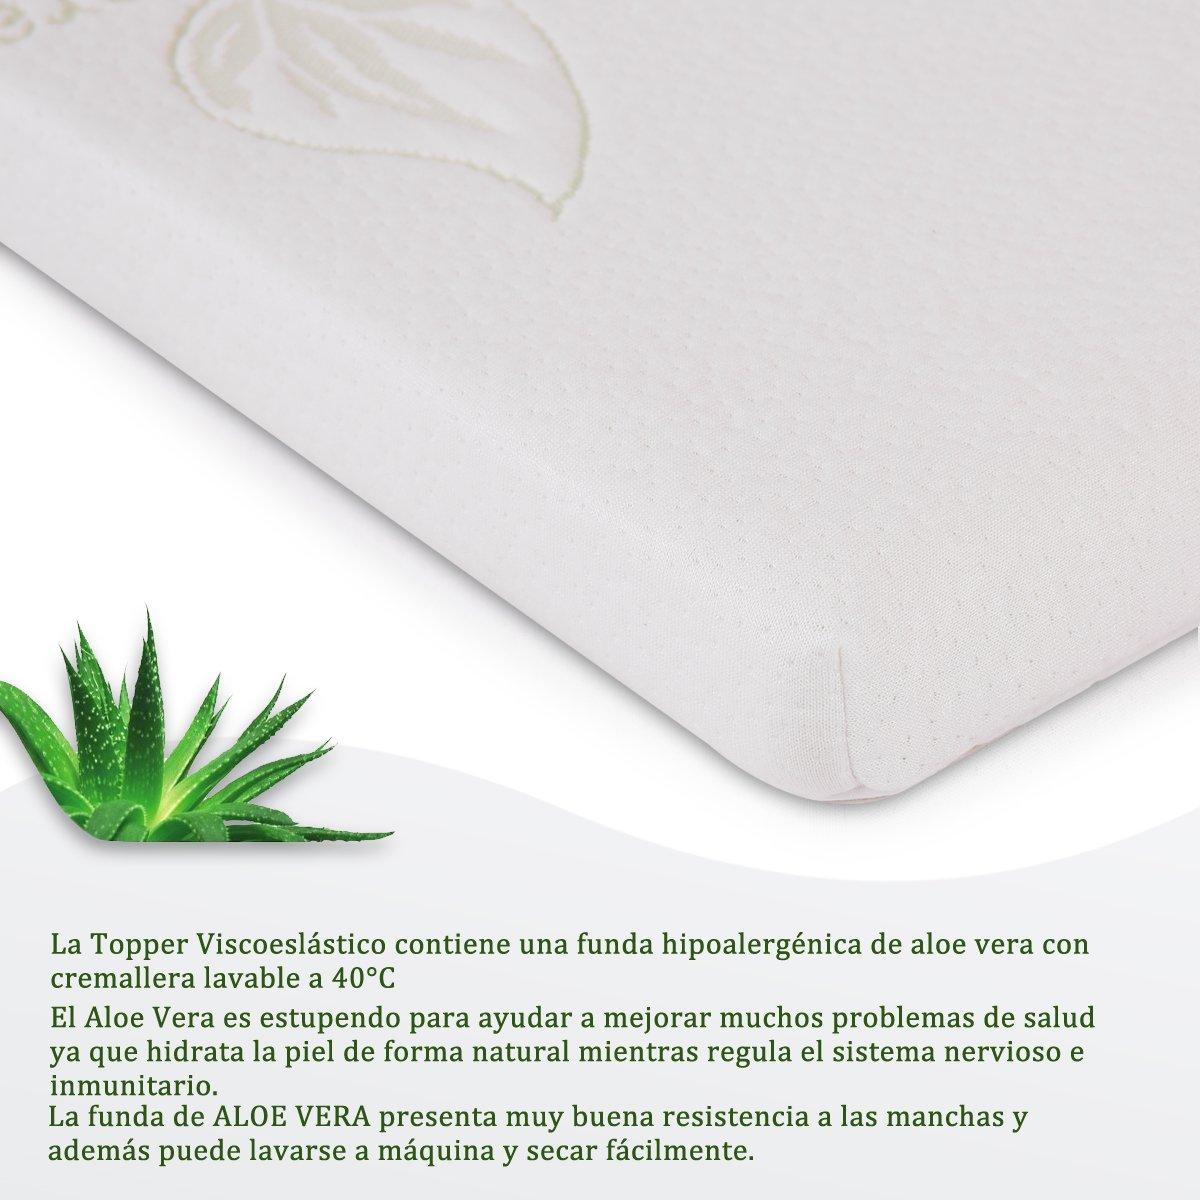 Cr Topper Viscoelástico con Efecto Memoria para Colchón 90 x 190 x 4 cm Protector de Colchón Funda Hipoalergénica Lavable de Aloe Vera Extraíble: Amazon.es: ...